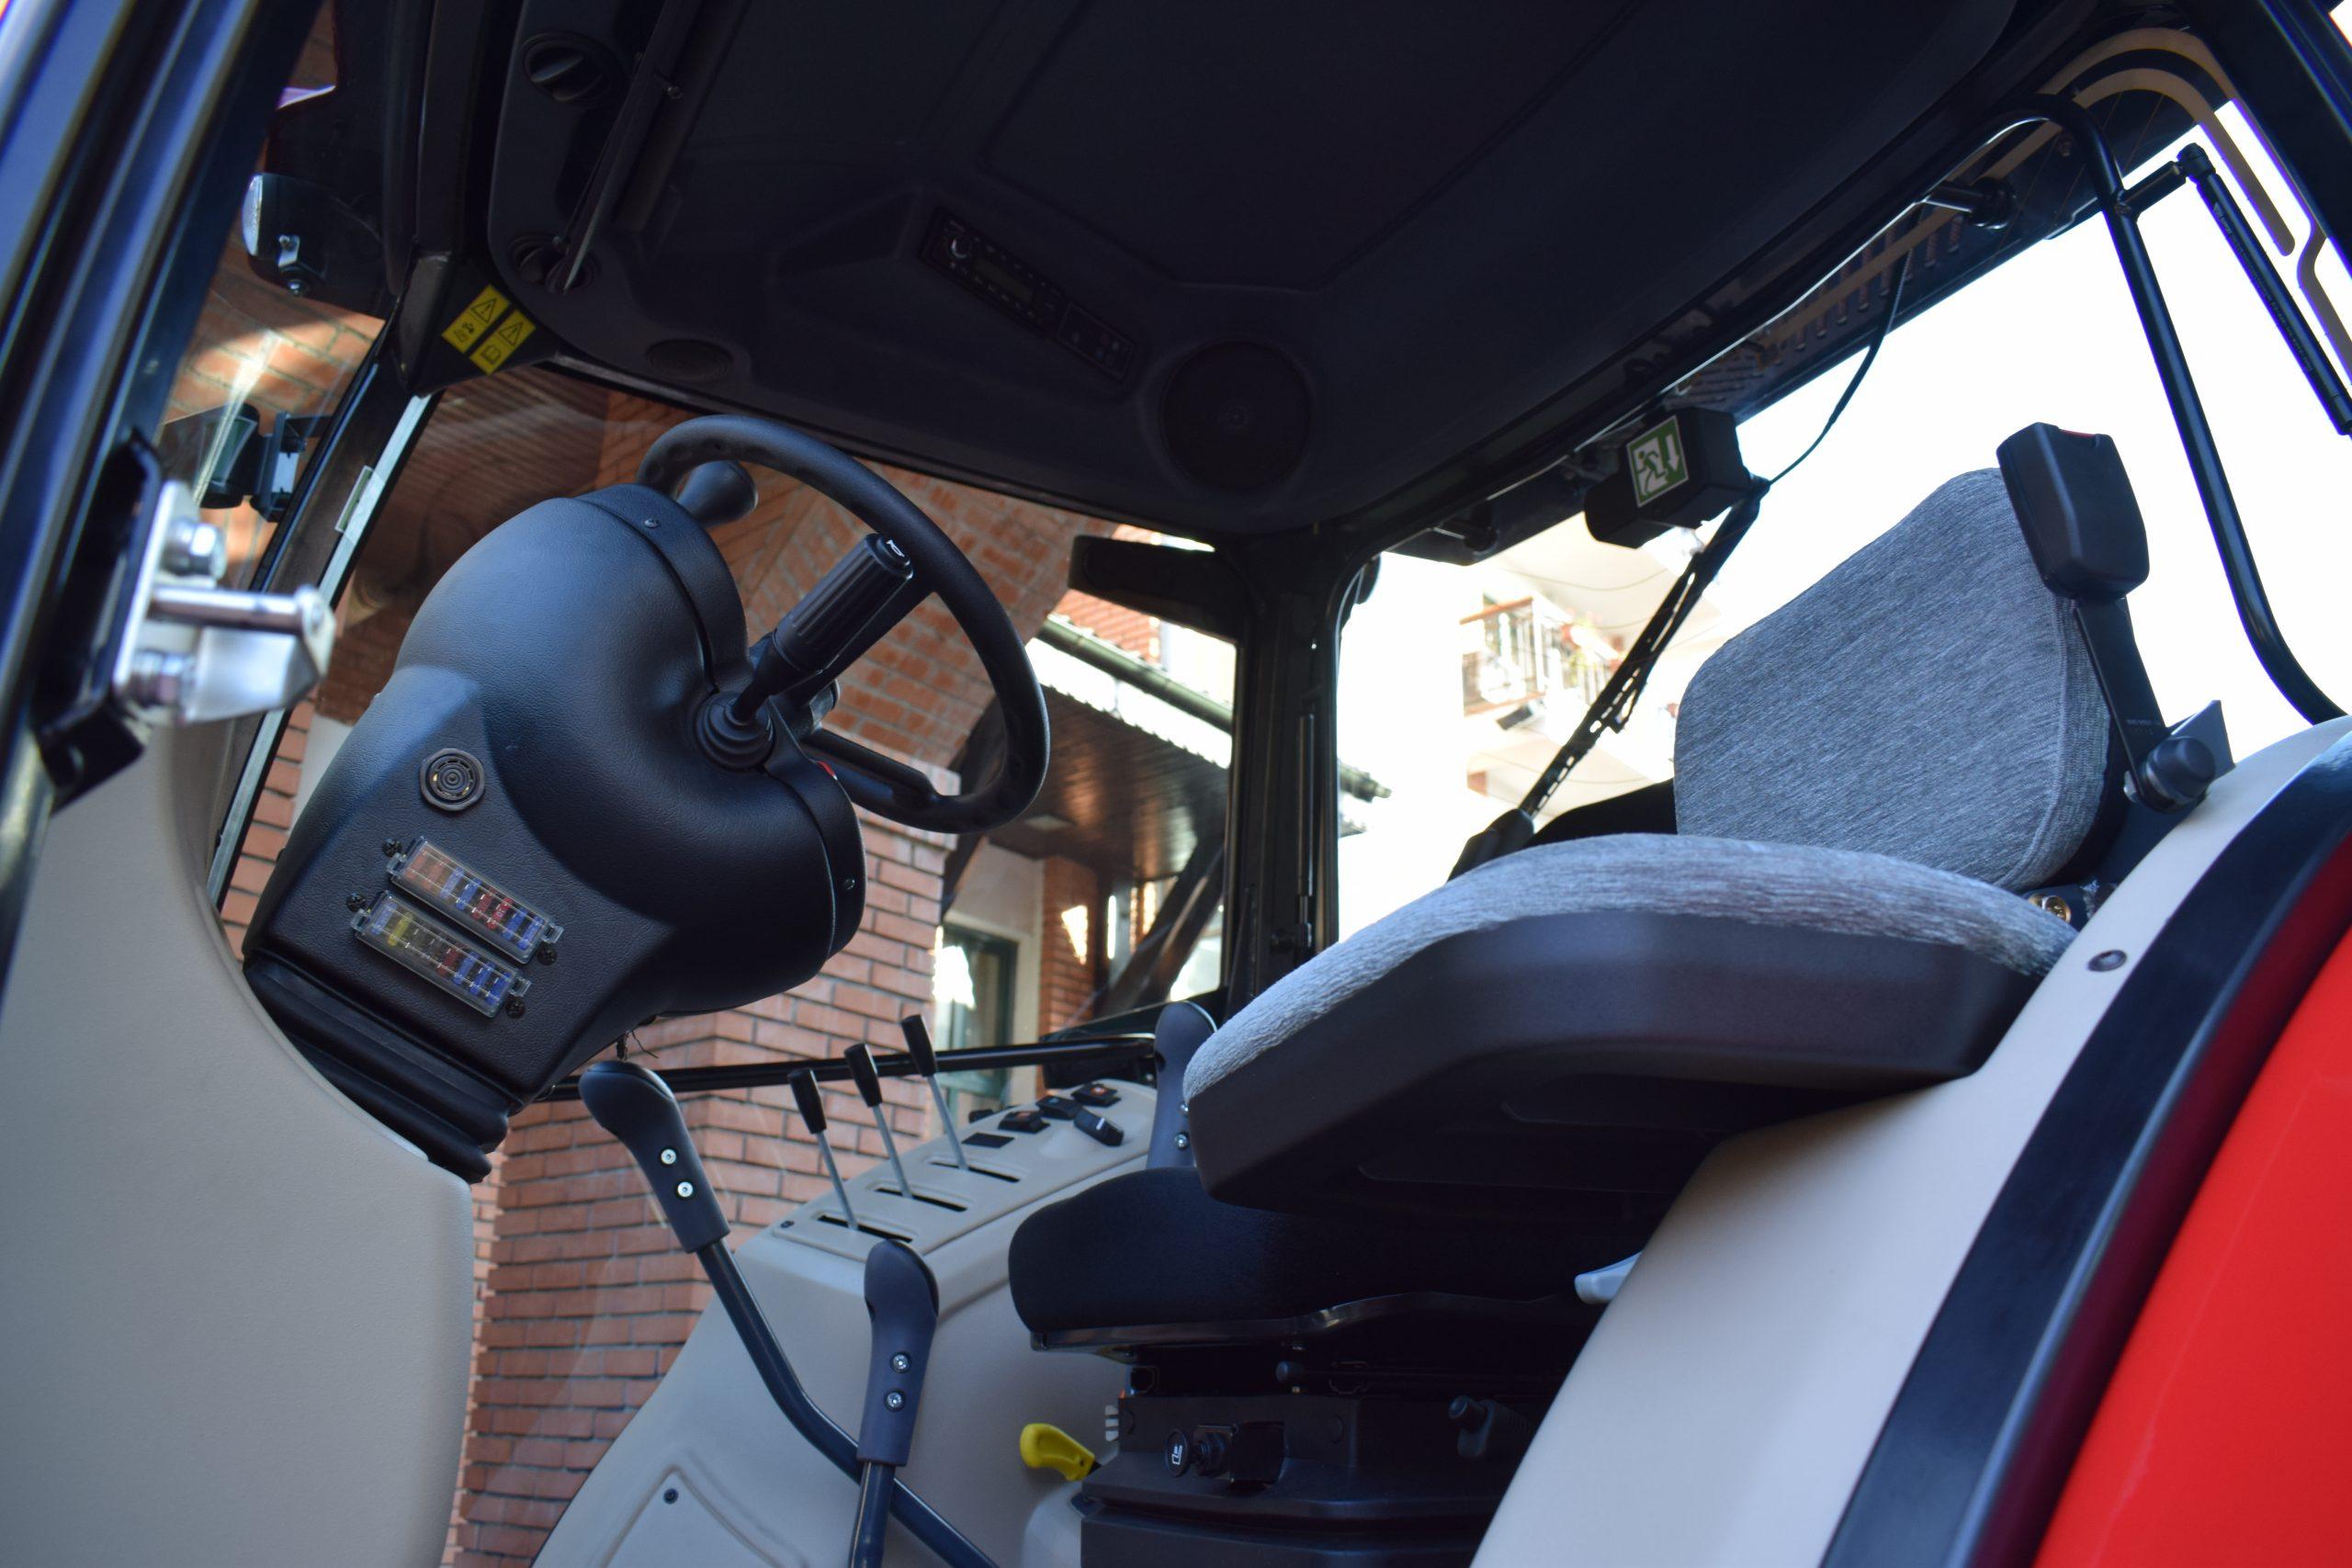 Tractor romanesc Tagro Irum cabina